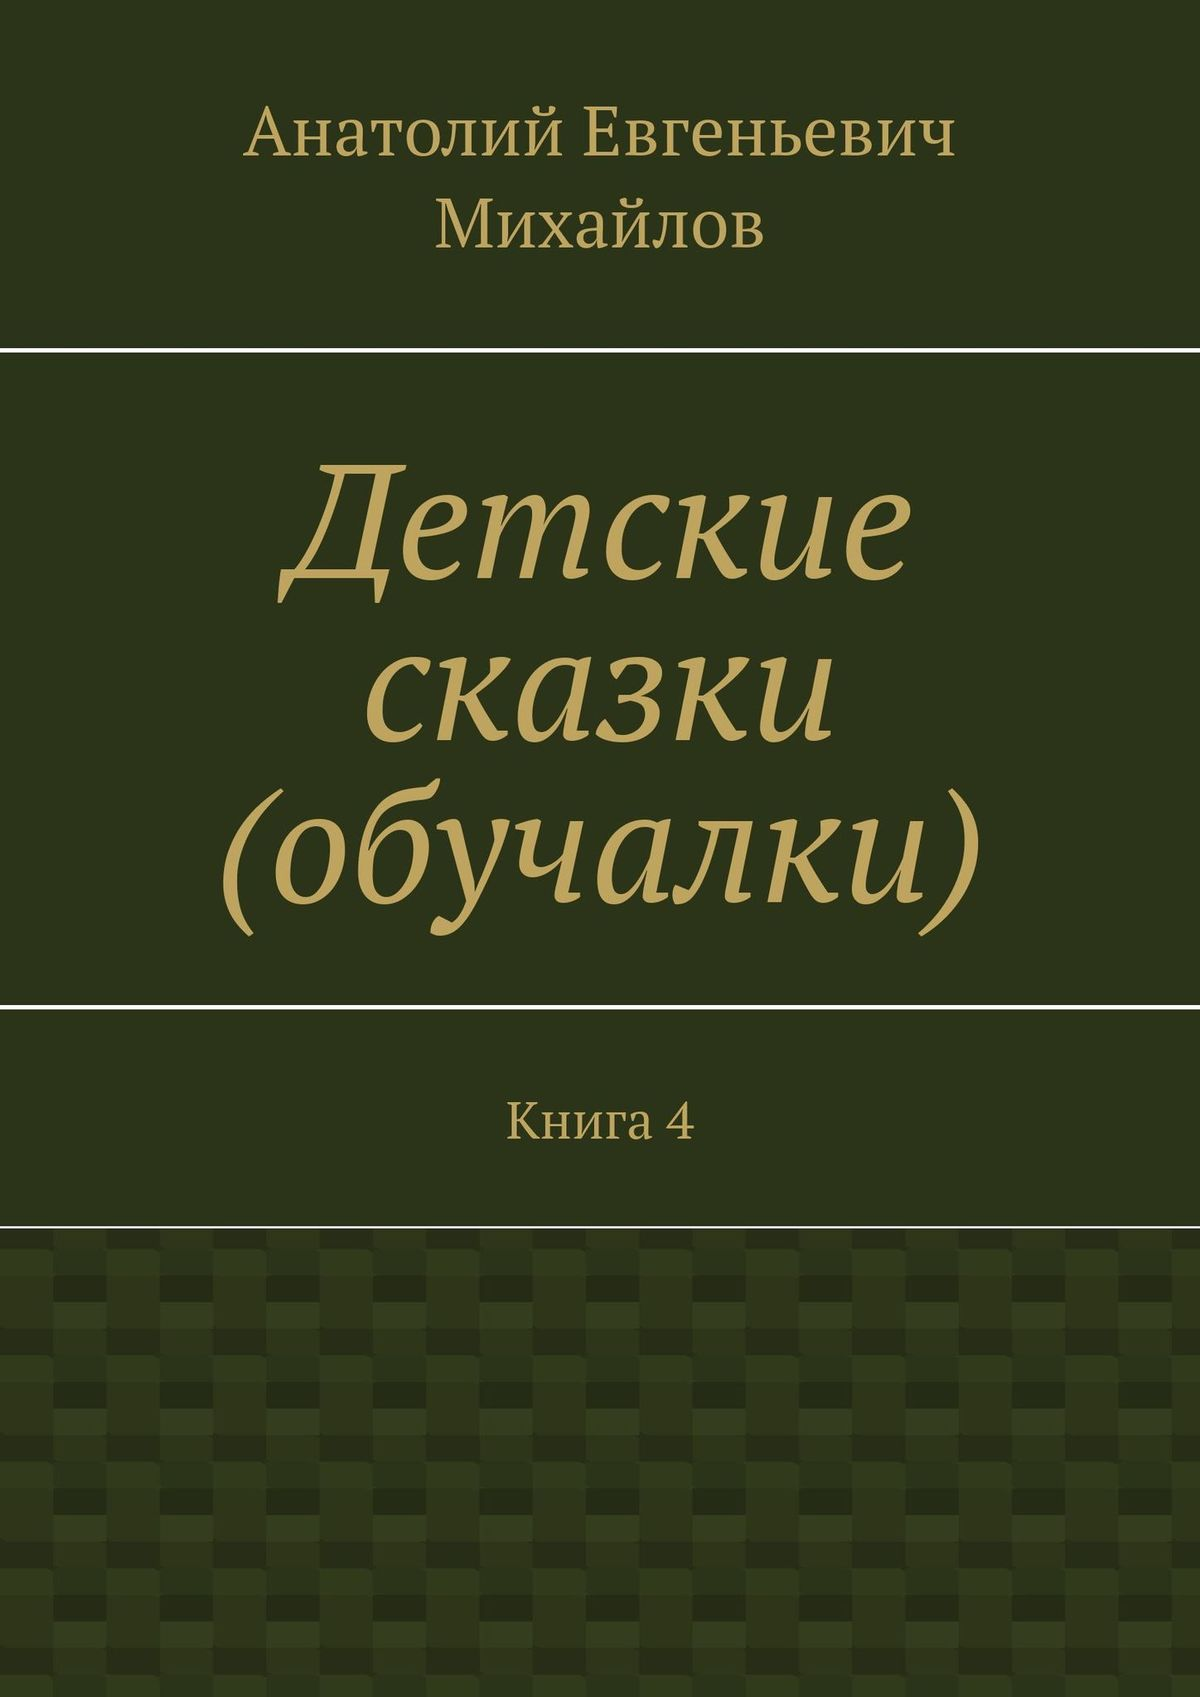 Детские сказки (обучалки). Книга4